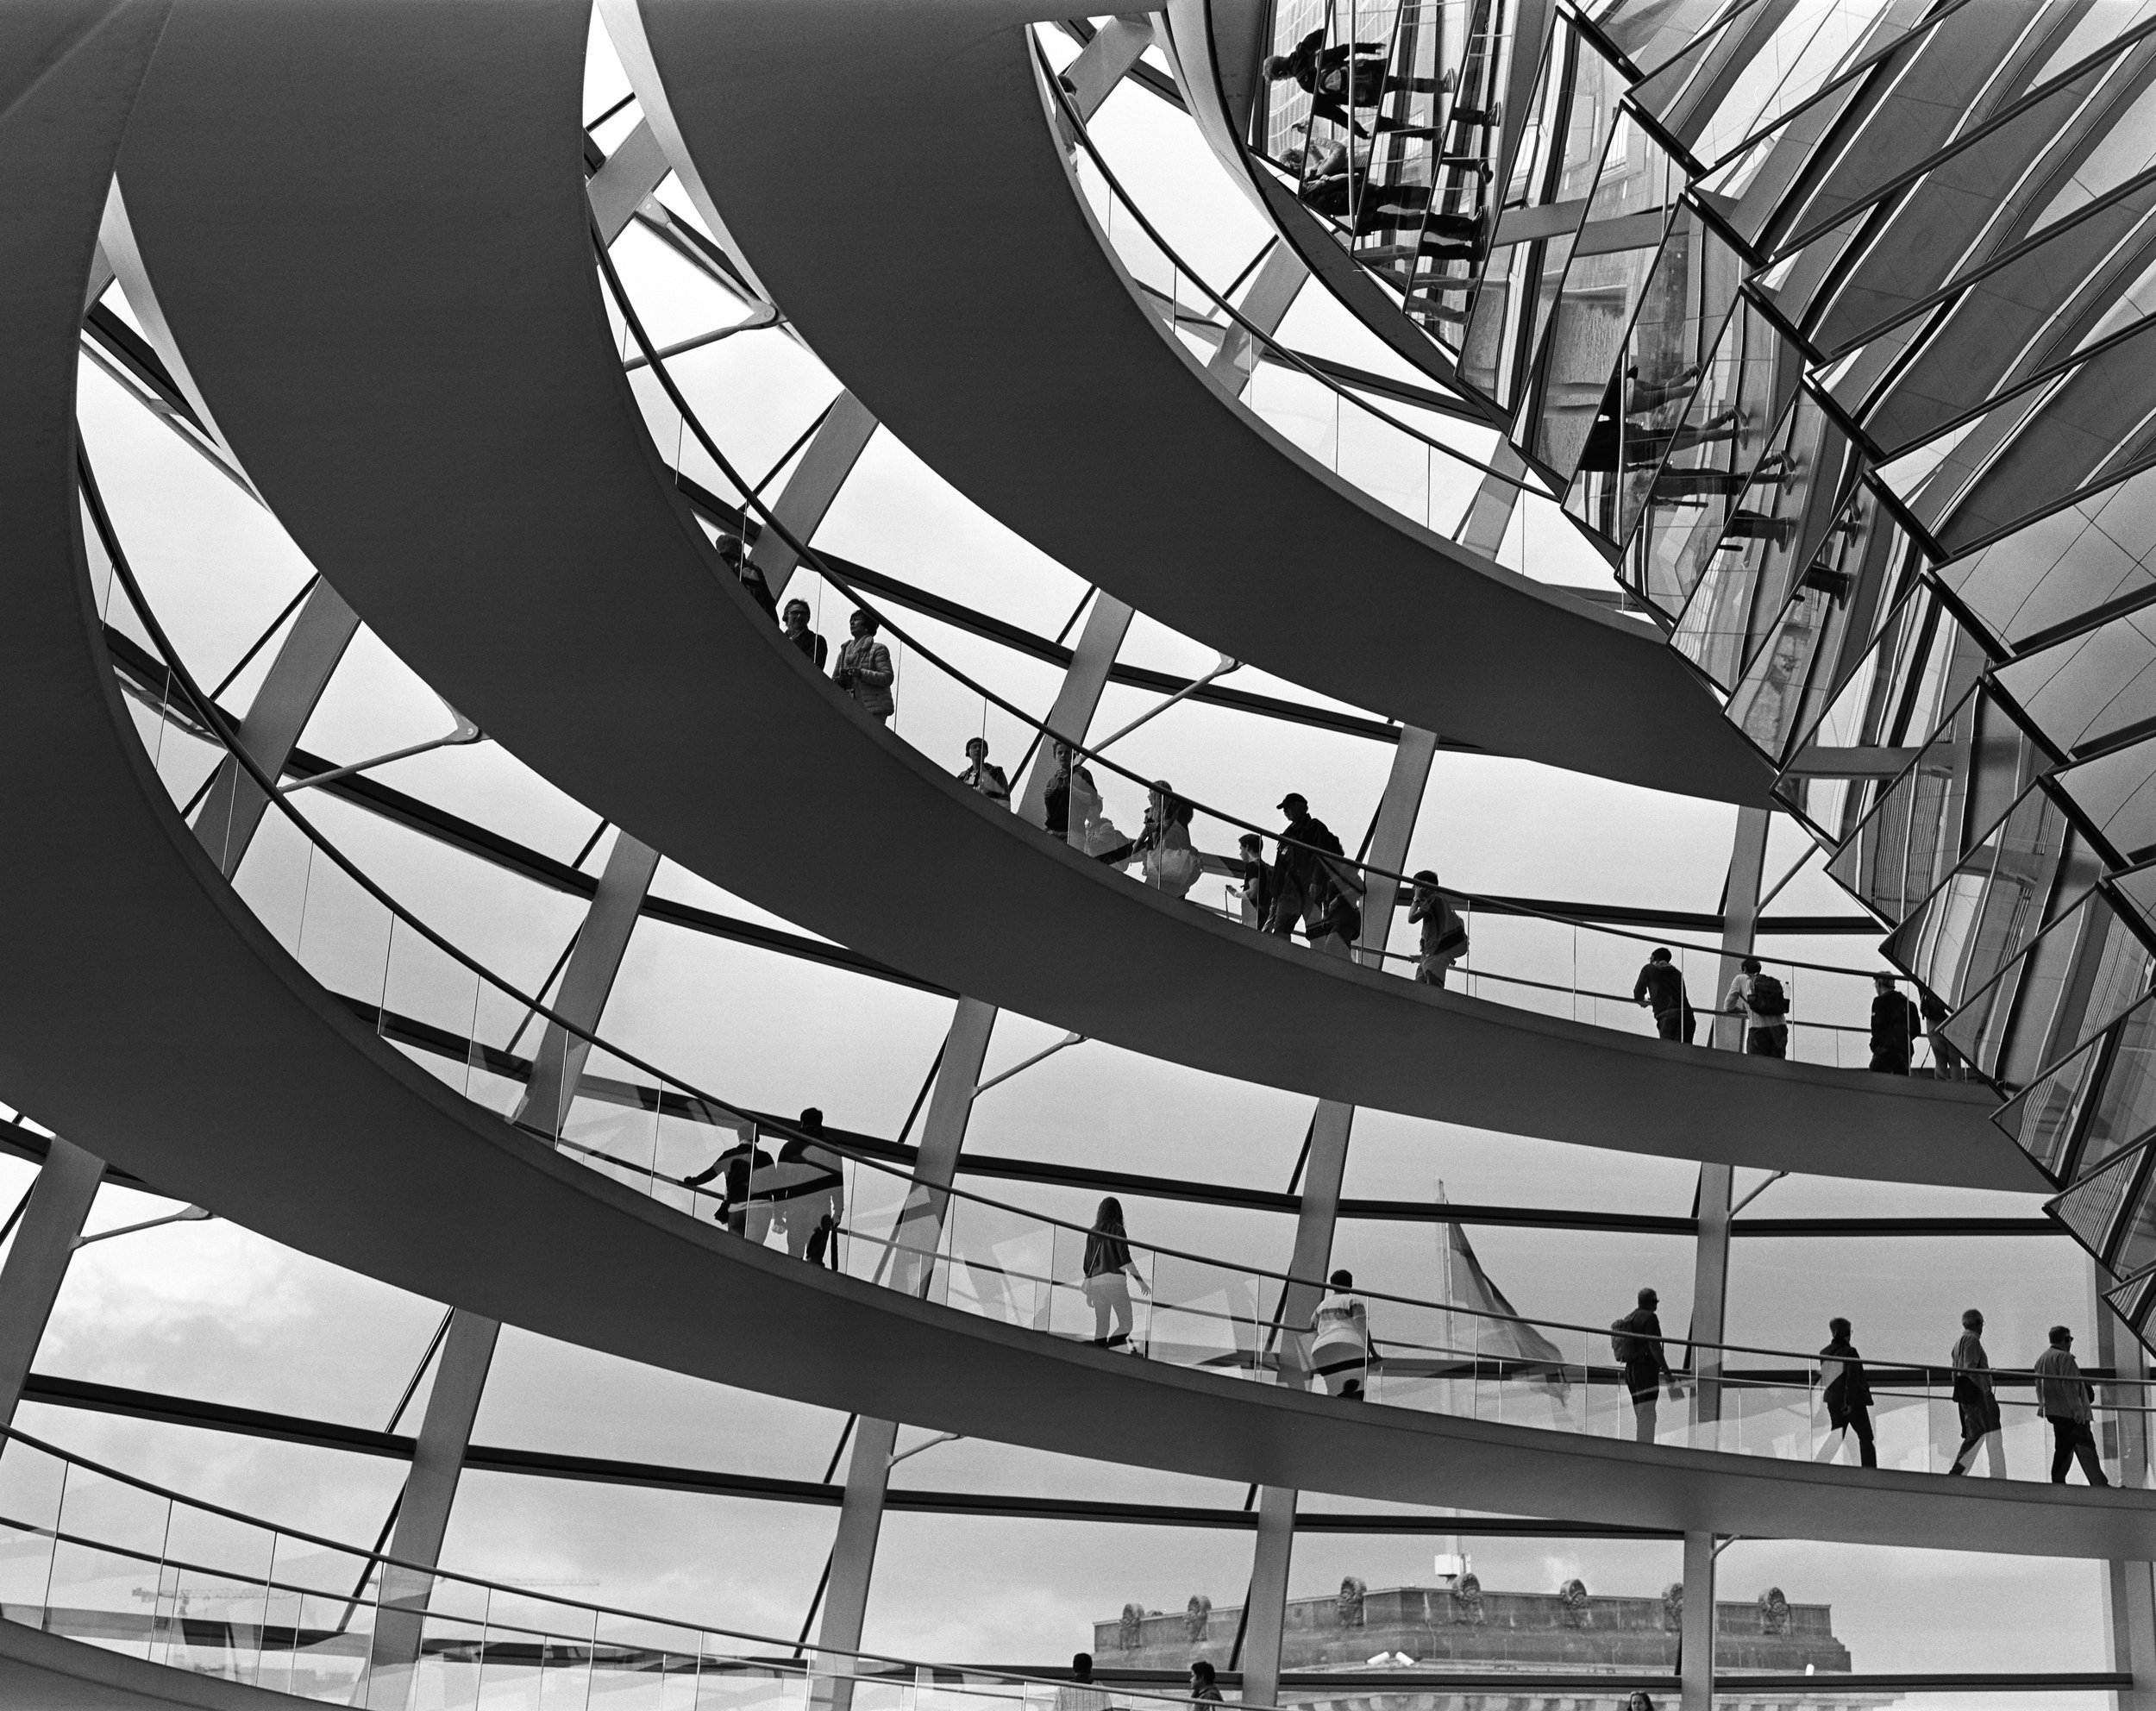 reichstag-dome_19302021271_o.jpg